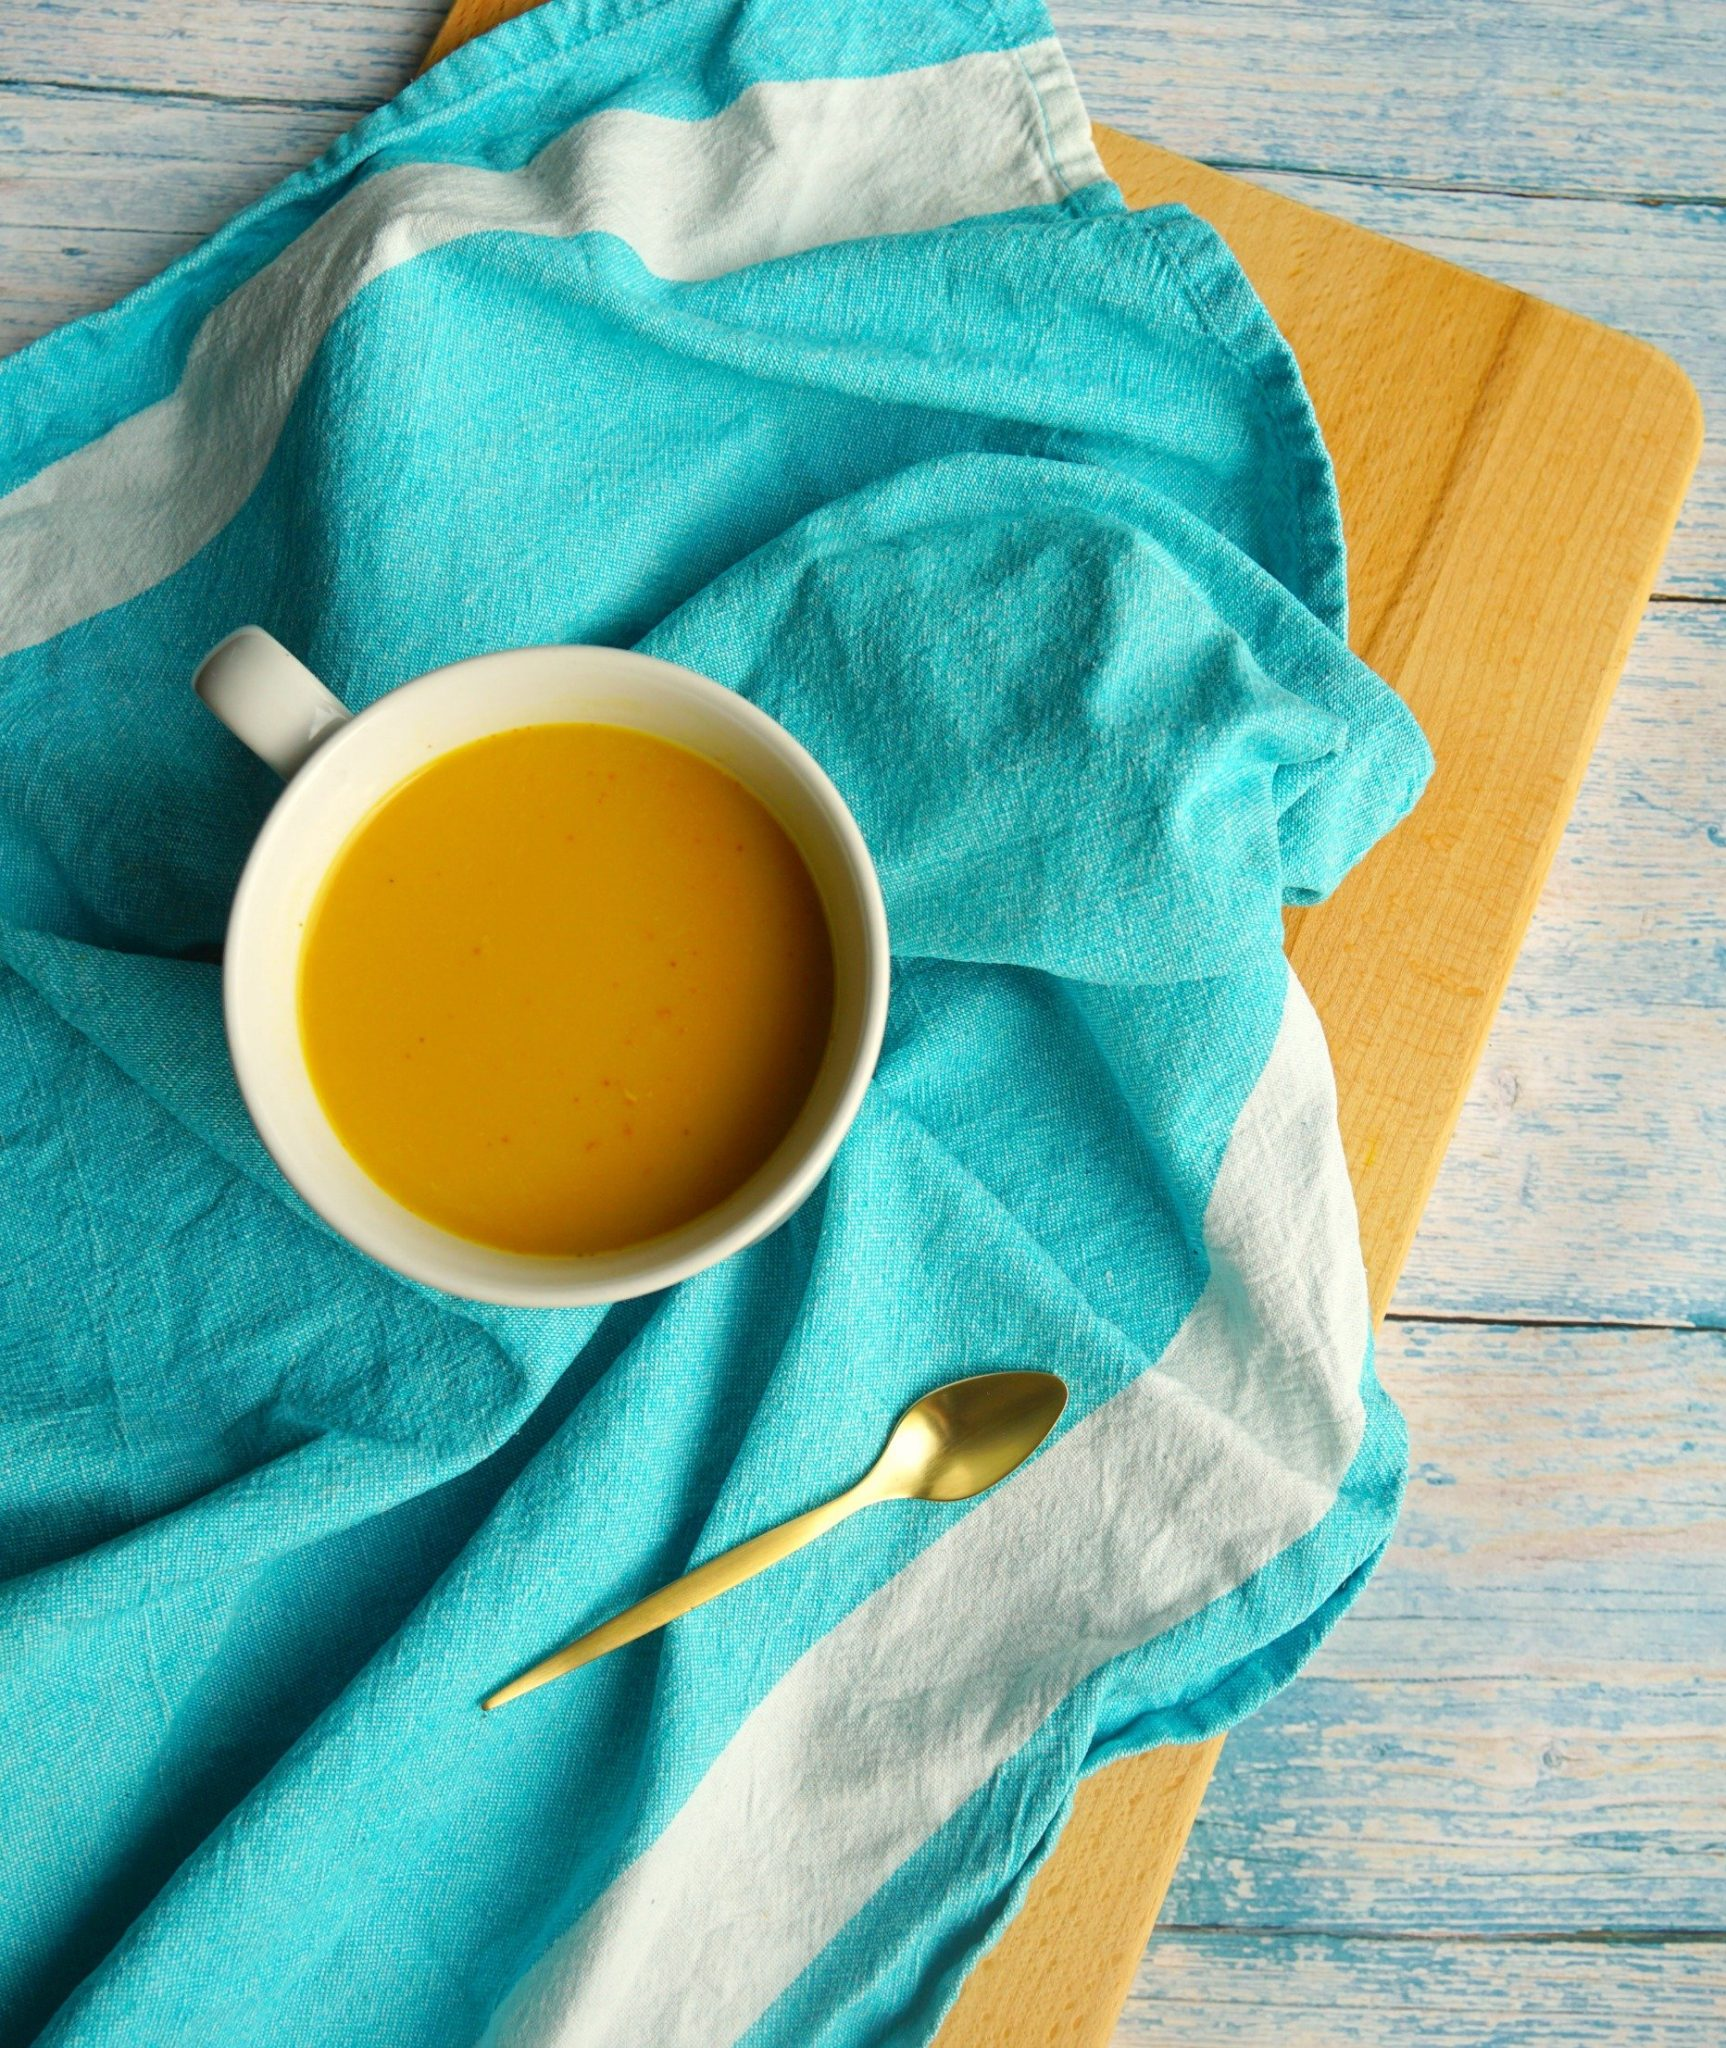 Turmeric Latte aka Golden Milk recipe